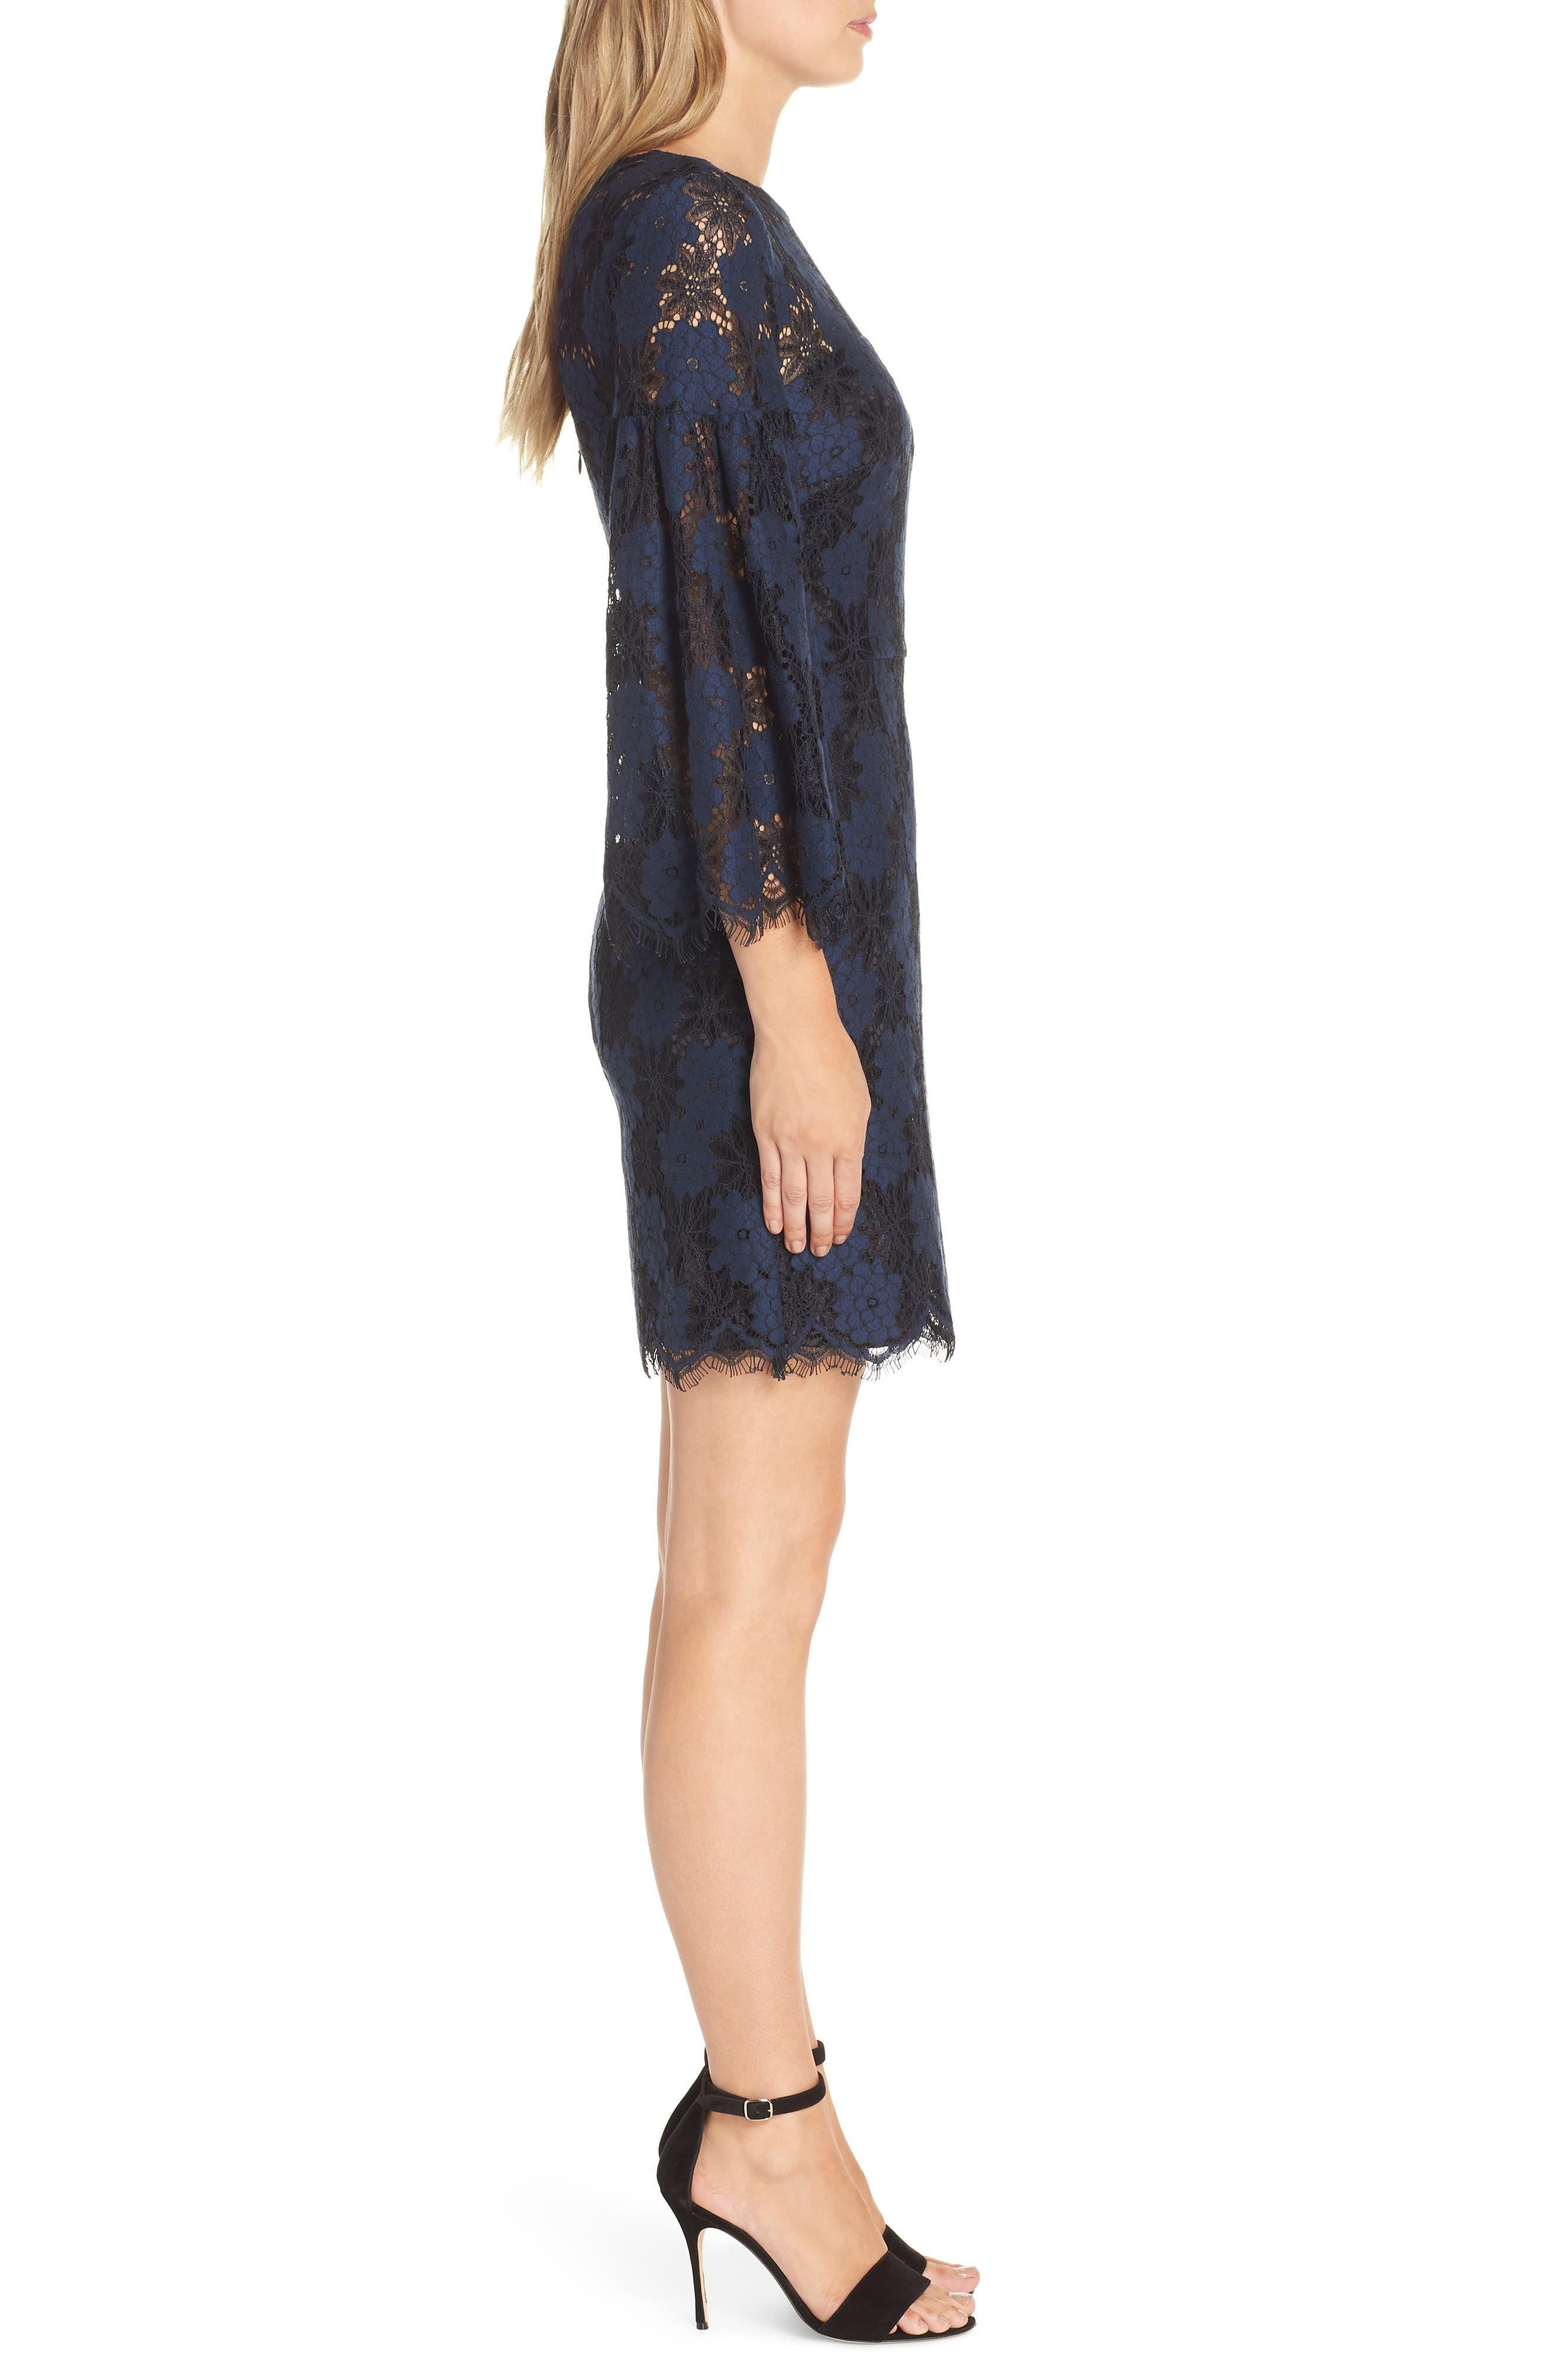 Two-Tone Lace Shift Dress,                             Alternate thumbnail 3, color,                             BLACK/ BLUE FLOWER